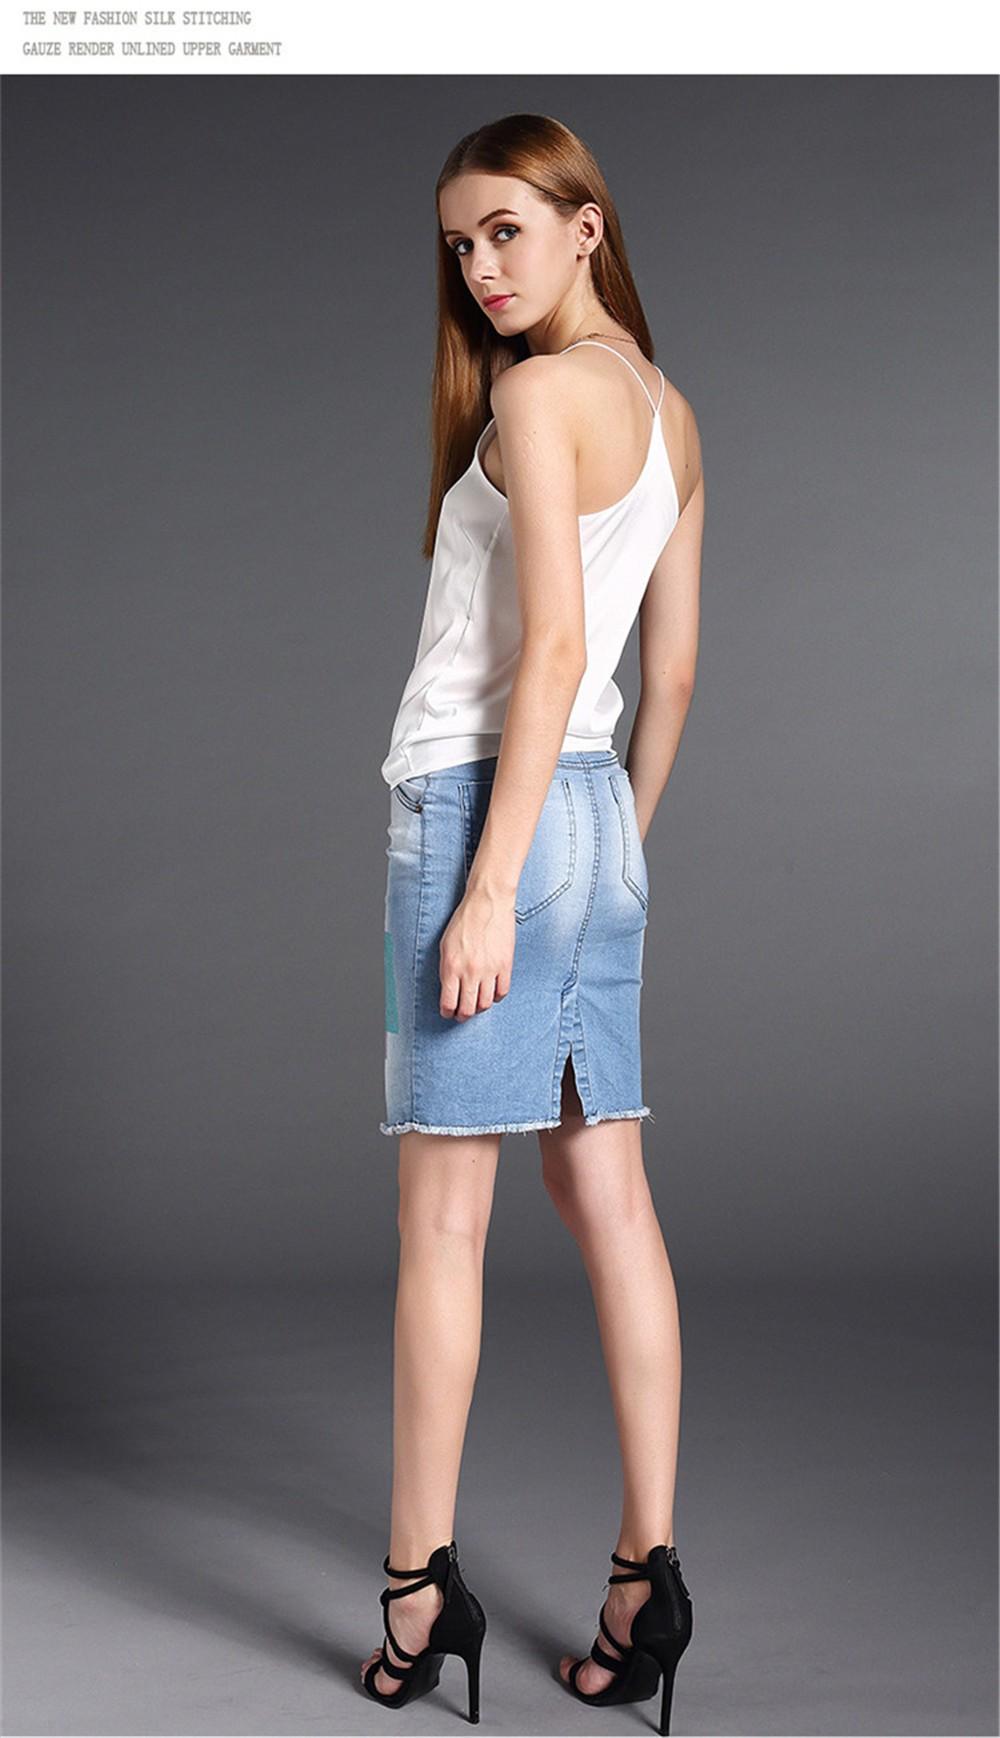 Plus Size S-4XL Multiple Women Tank Tops Brand Silk Blending Sleeveless Tshirt Women Female Shirt Smooth Blouse Blusas Femininas (15)